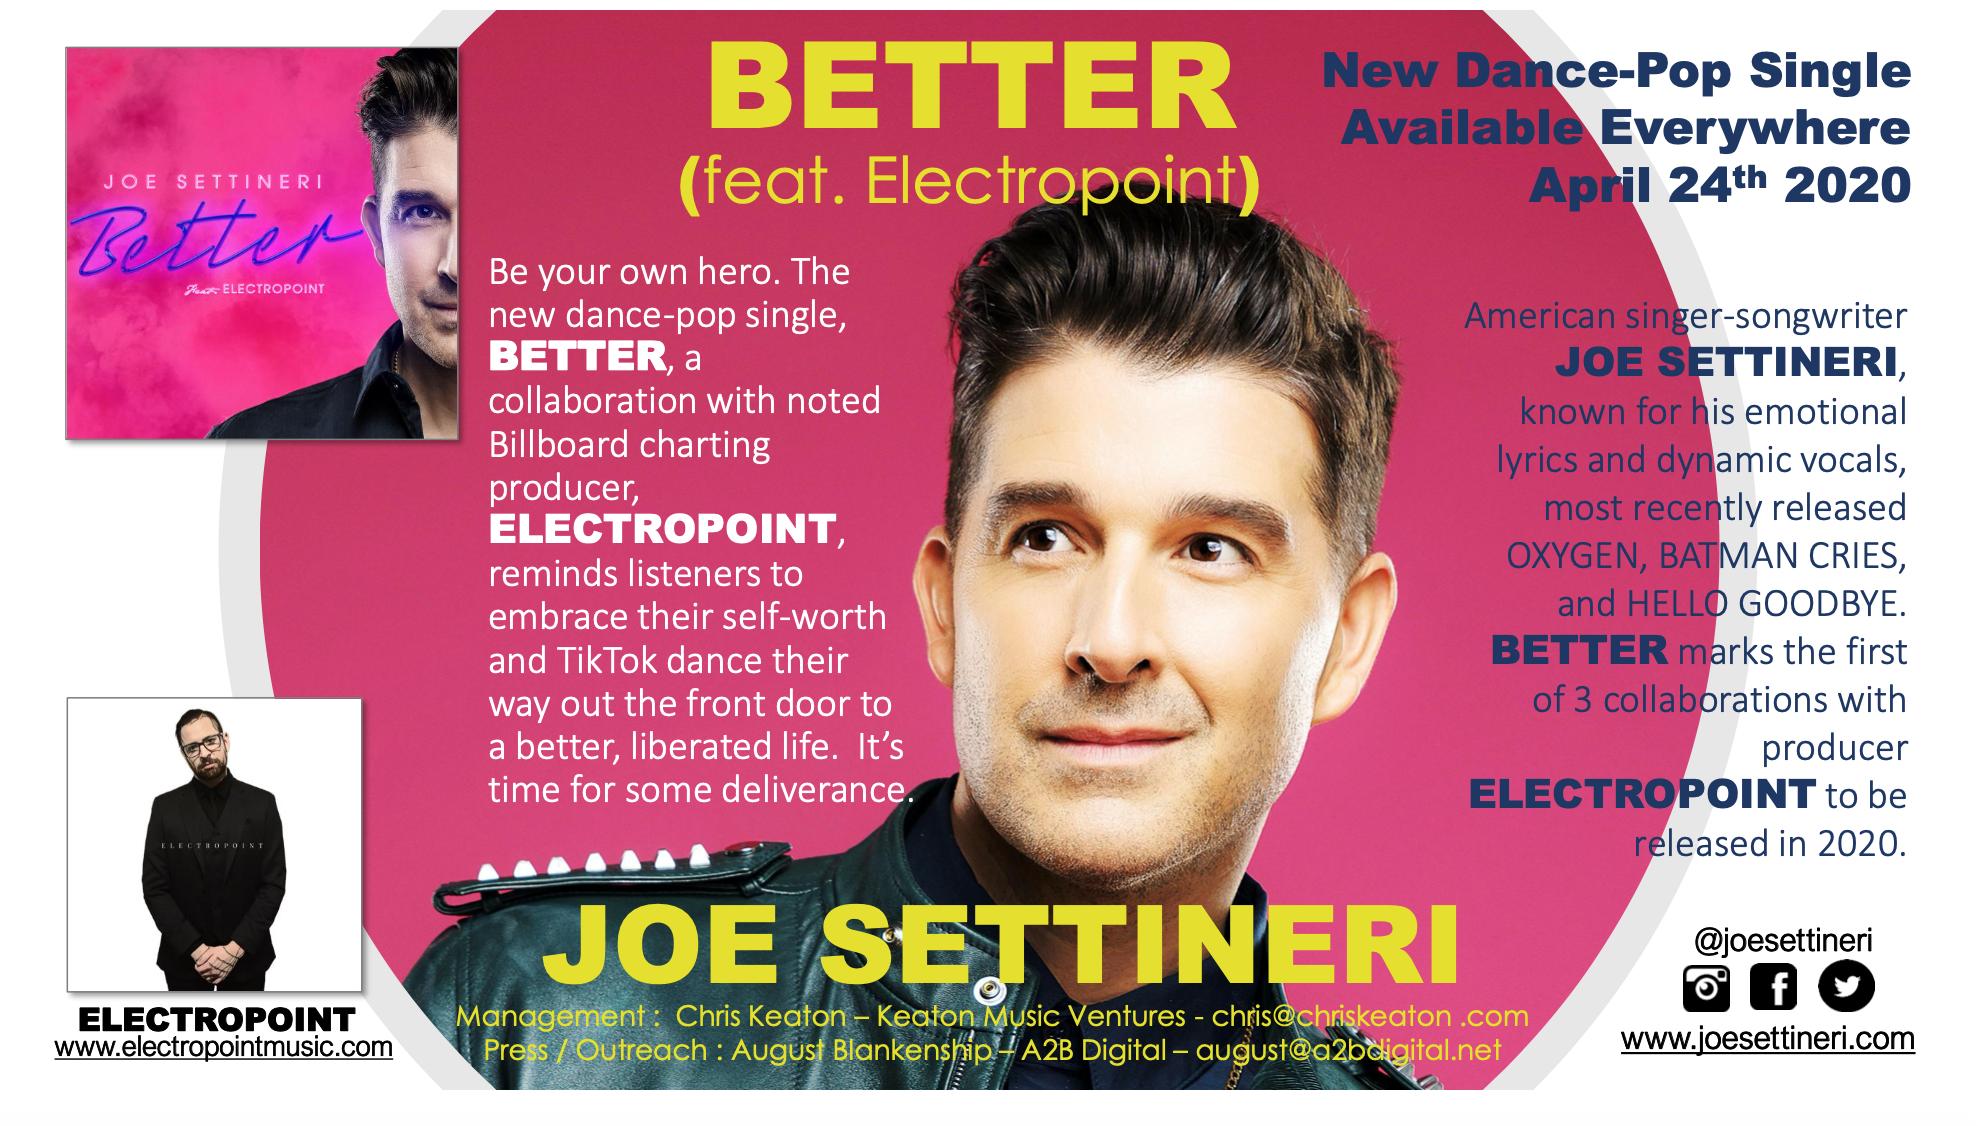 Better: Joe Settineri